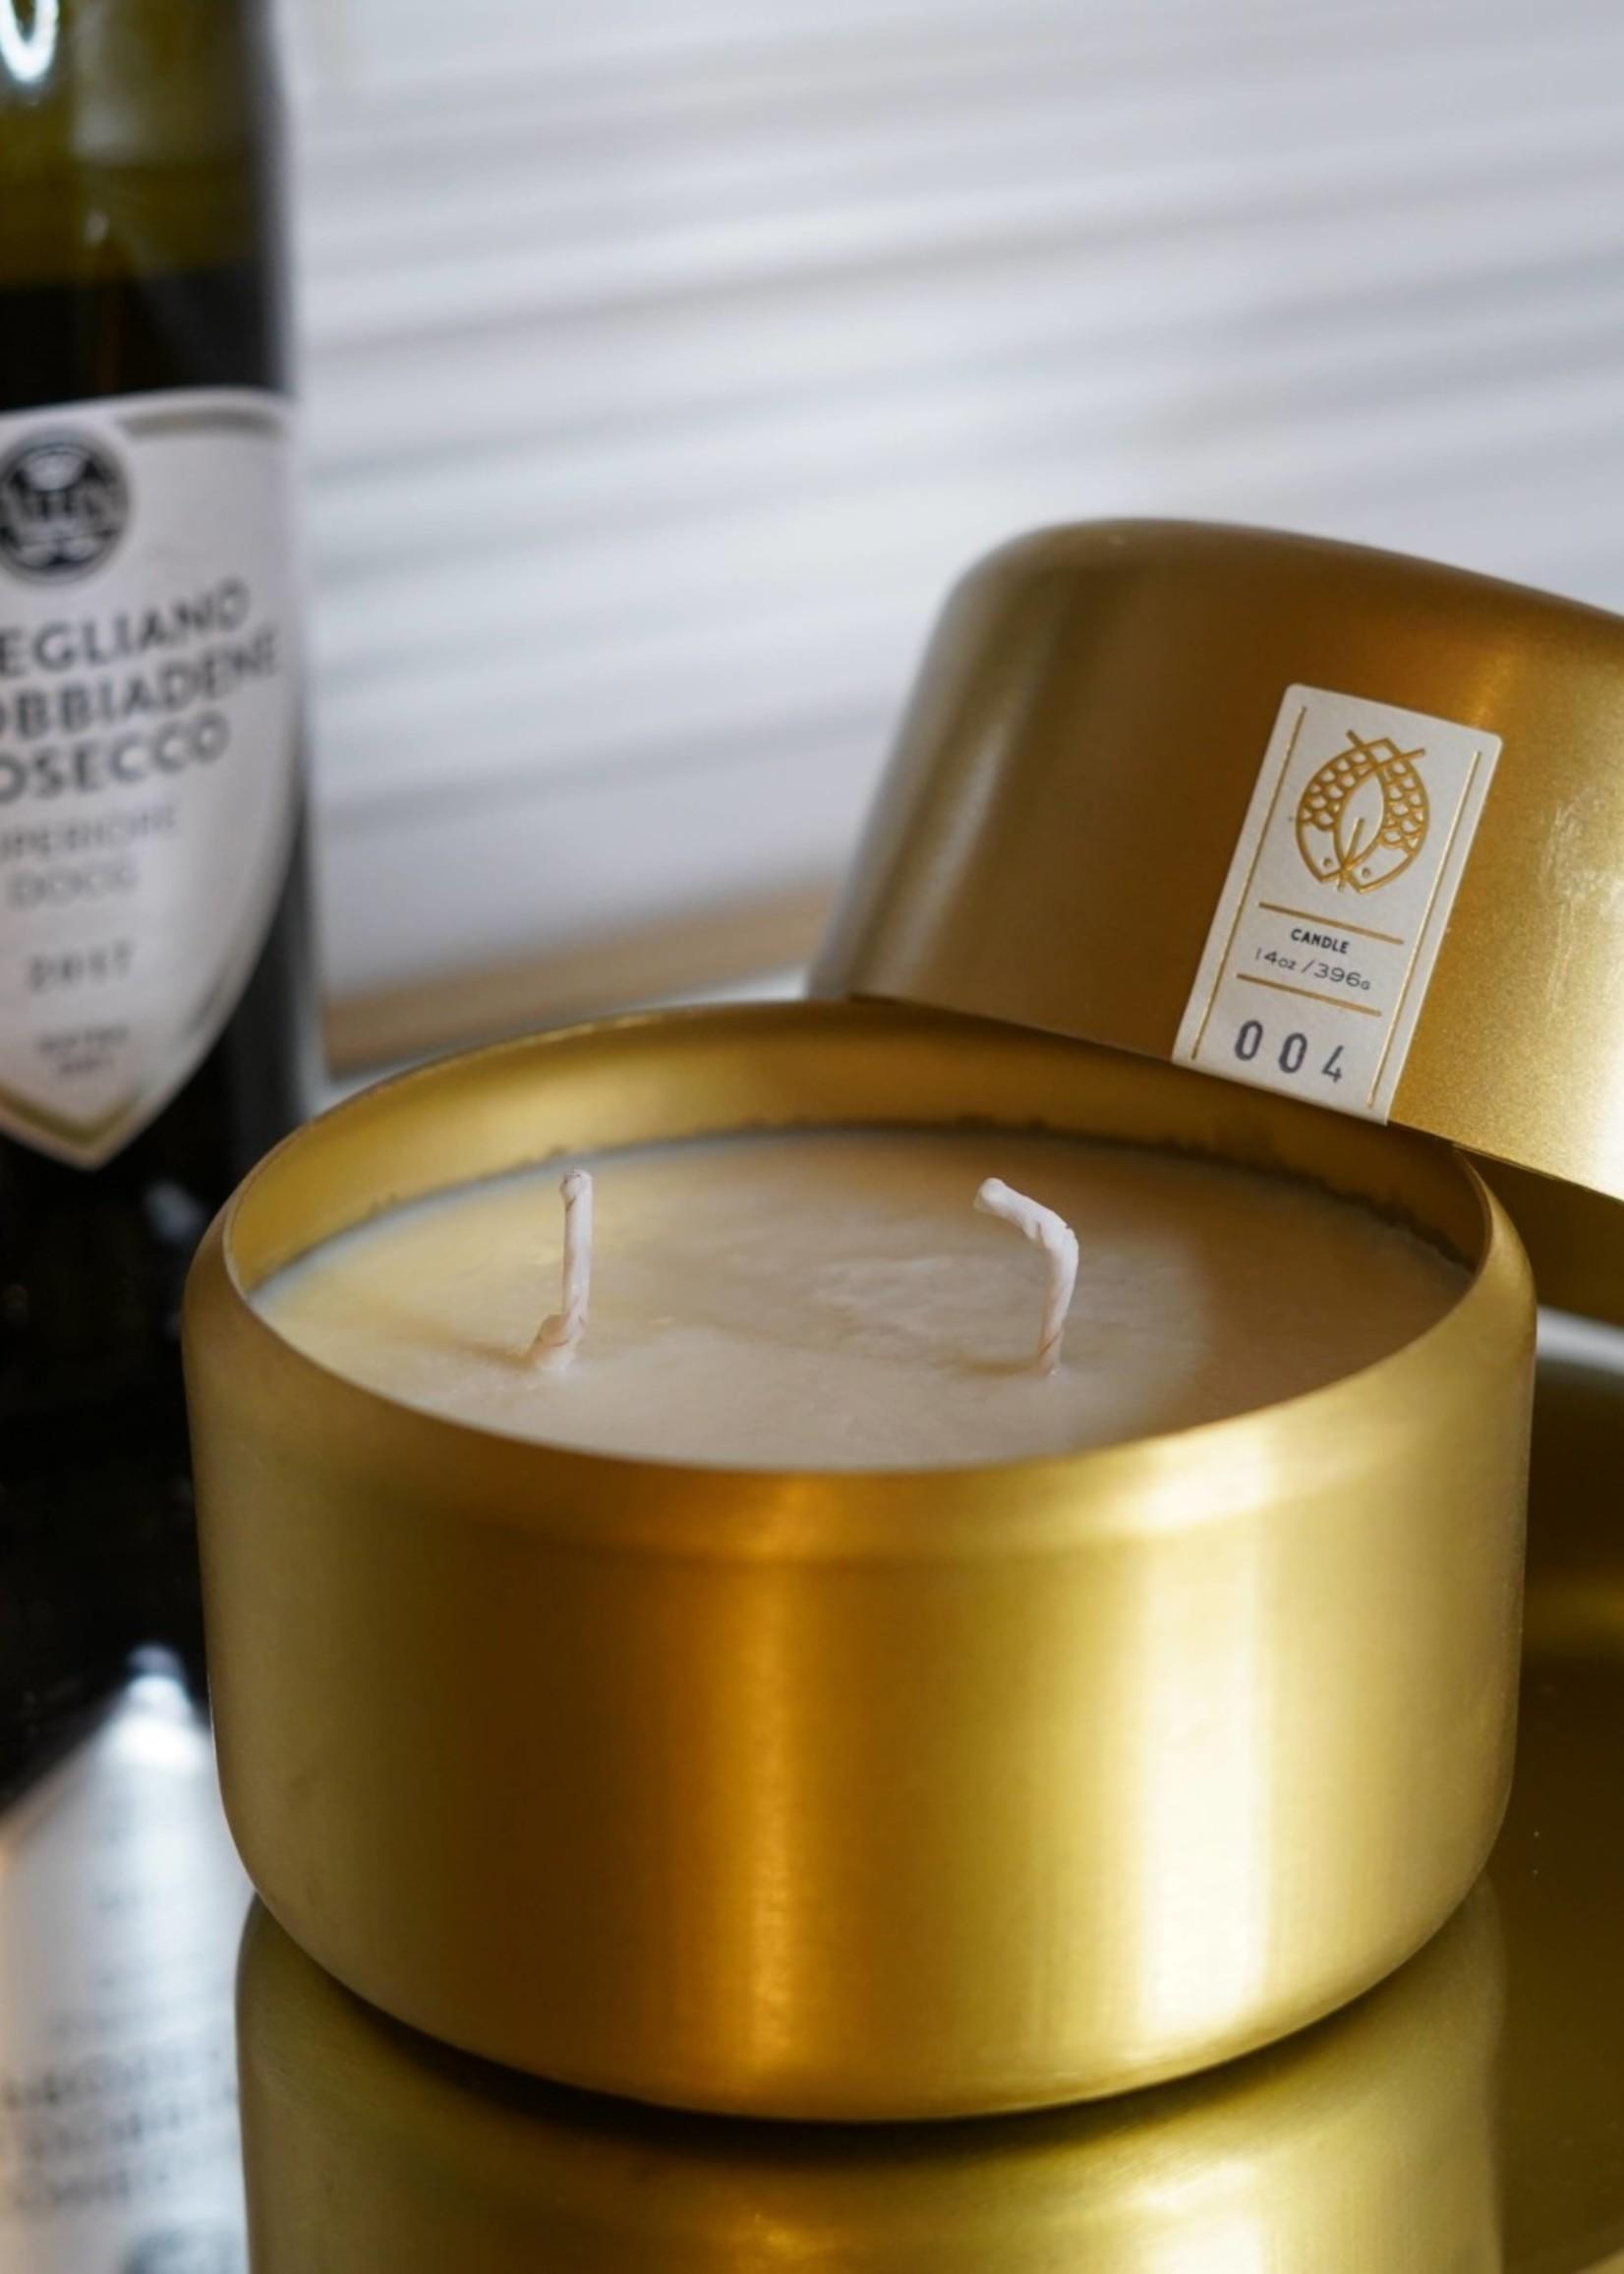 Candlefish No. 67 Molded Metal 14 oz Candle